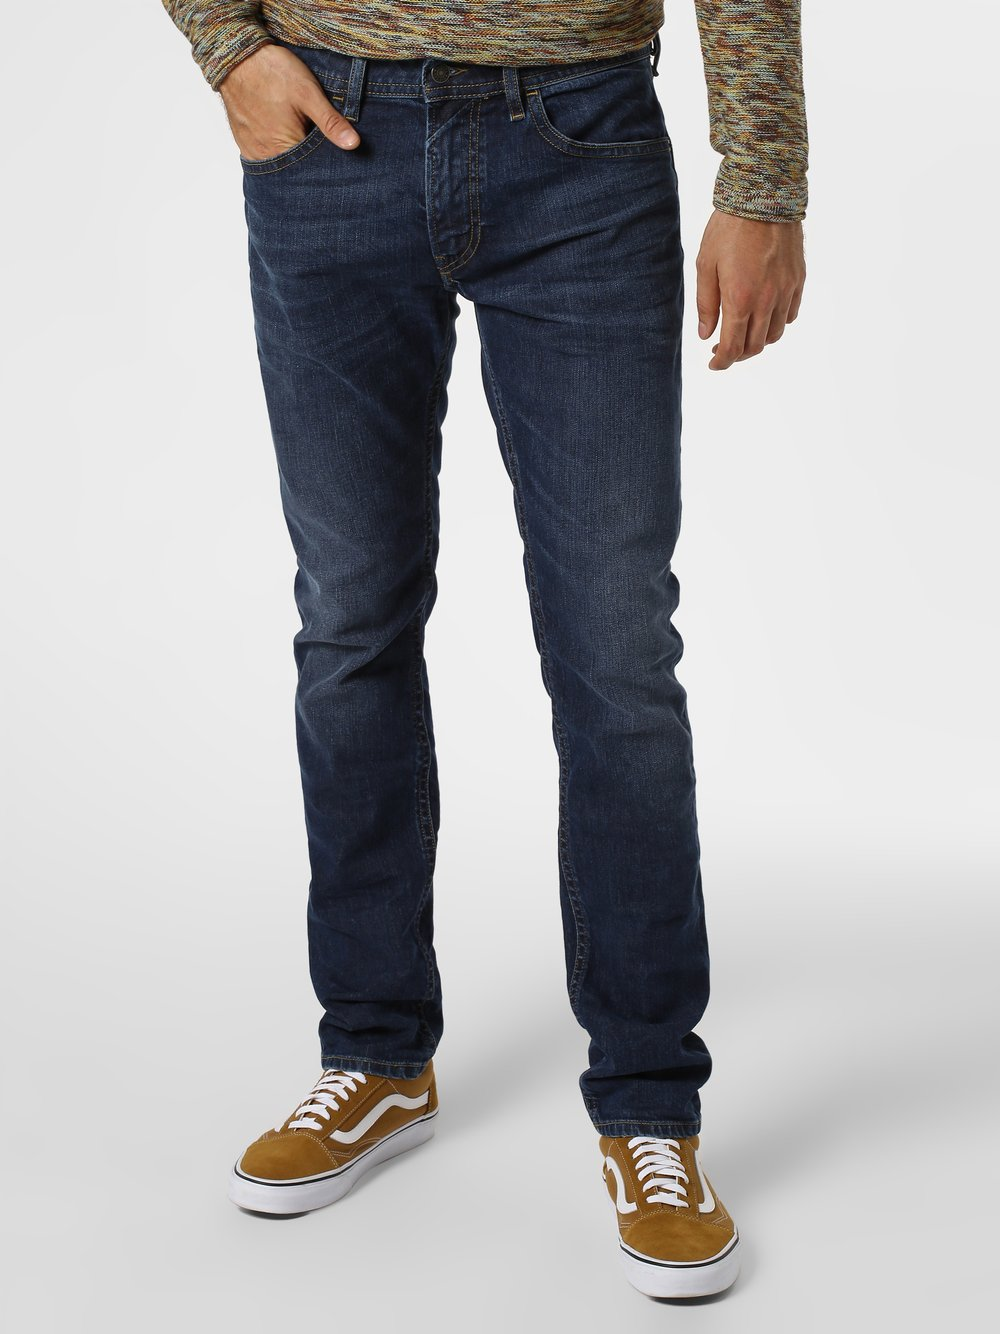 Diesel - Jeansy męskie, niebieski